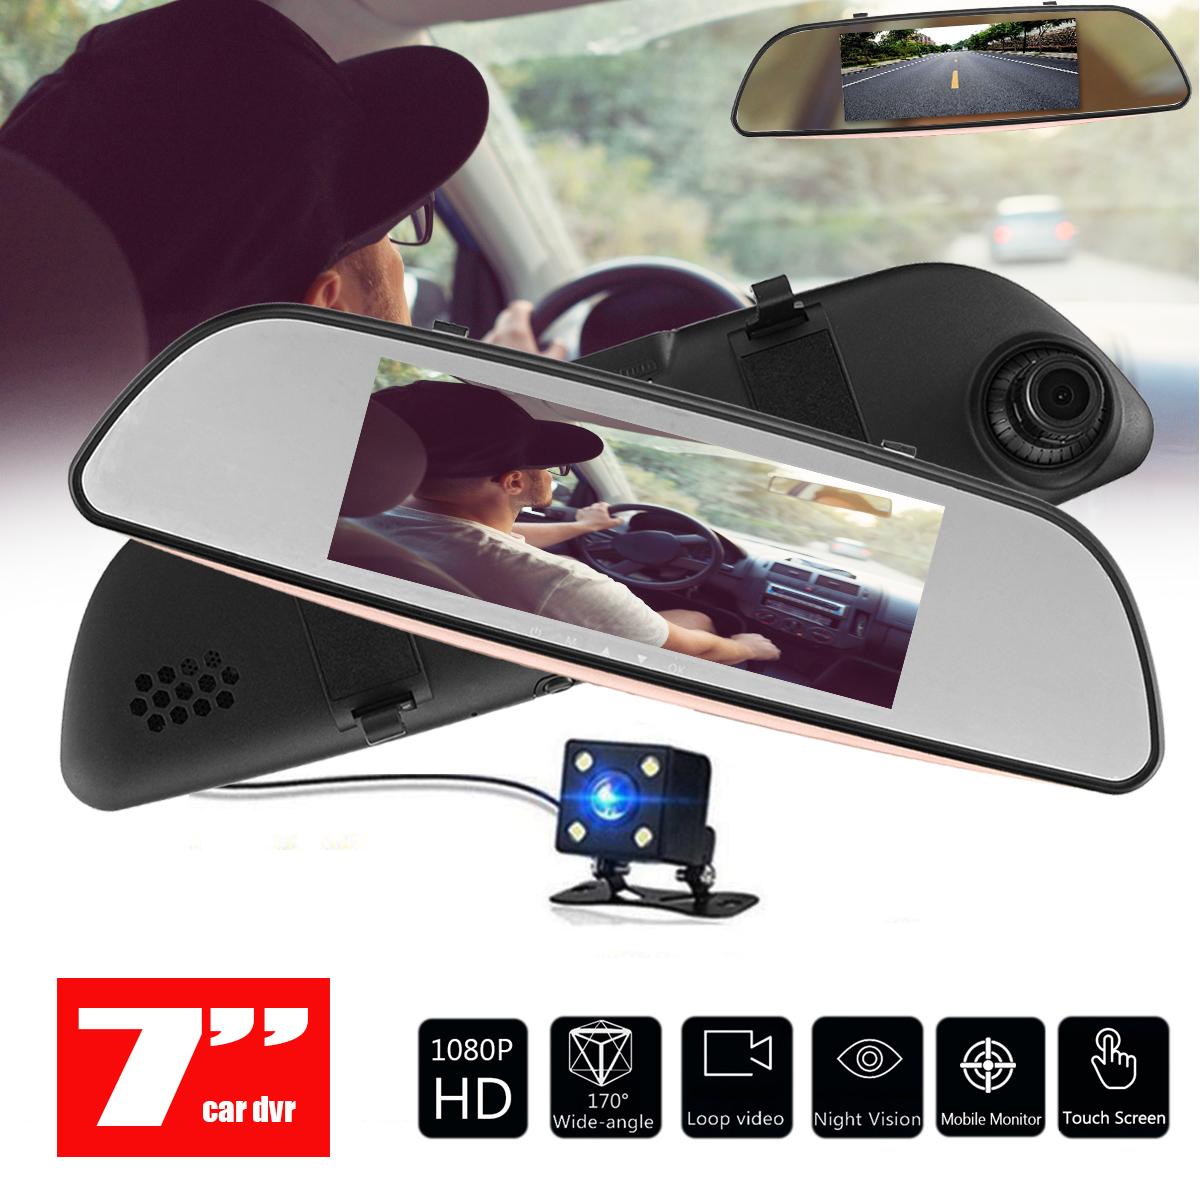 "170° A+ HD wide angle 7"" 1080P HD Rear view Blue Mirror Dual Lens touch screen Car DVR Dash Cam Camera Recorder"